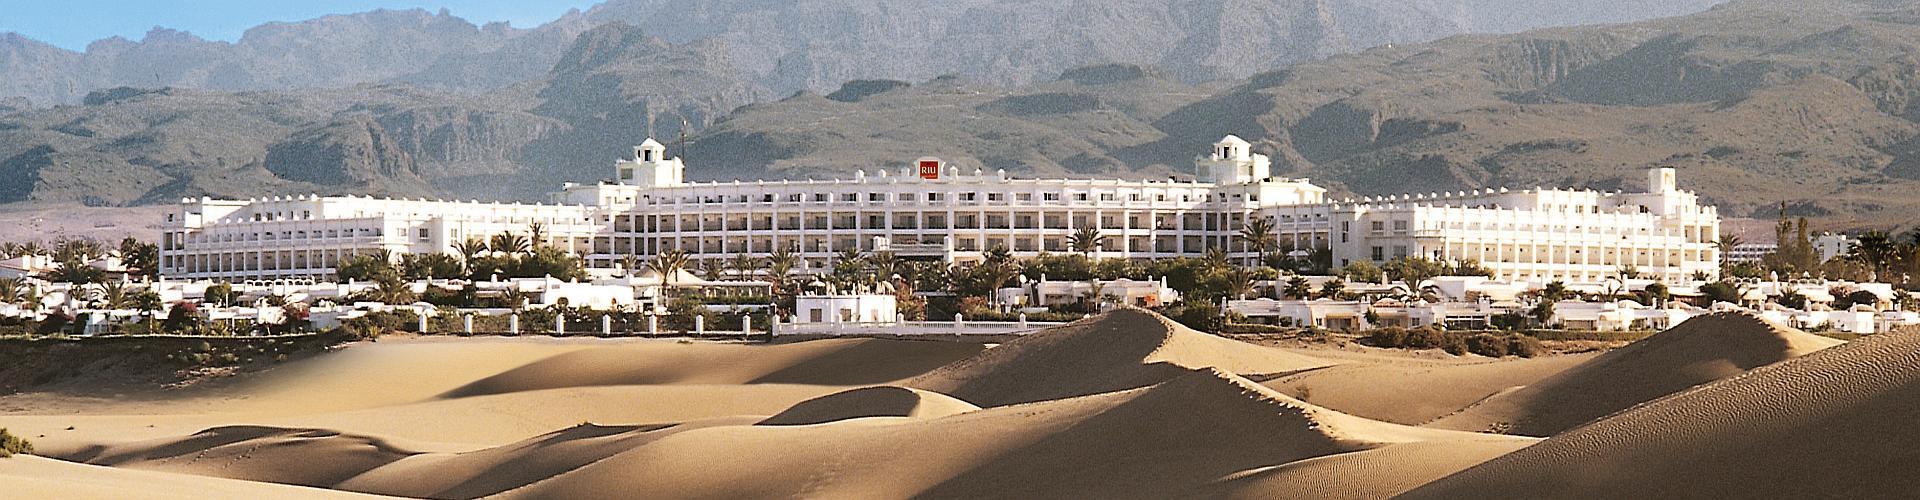 RIU Hotel ist komfortabler Urlaub am Meer